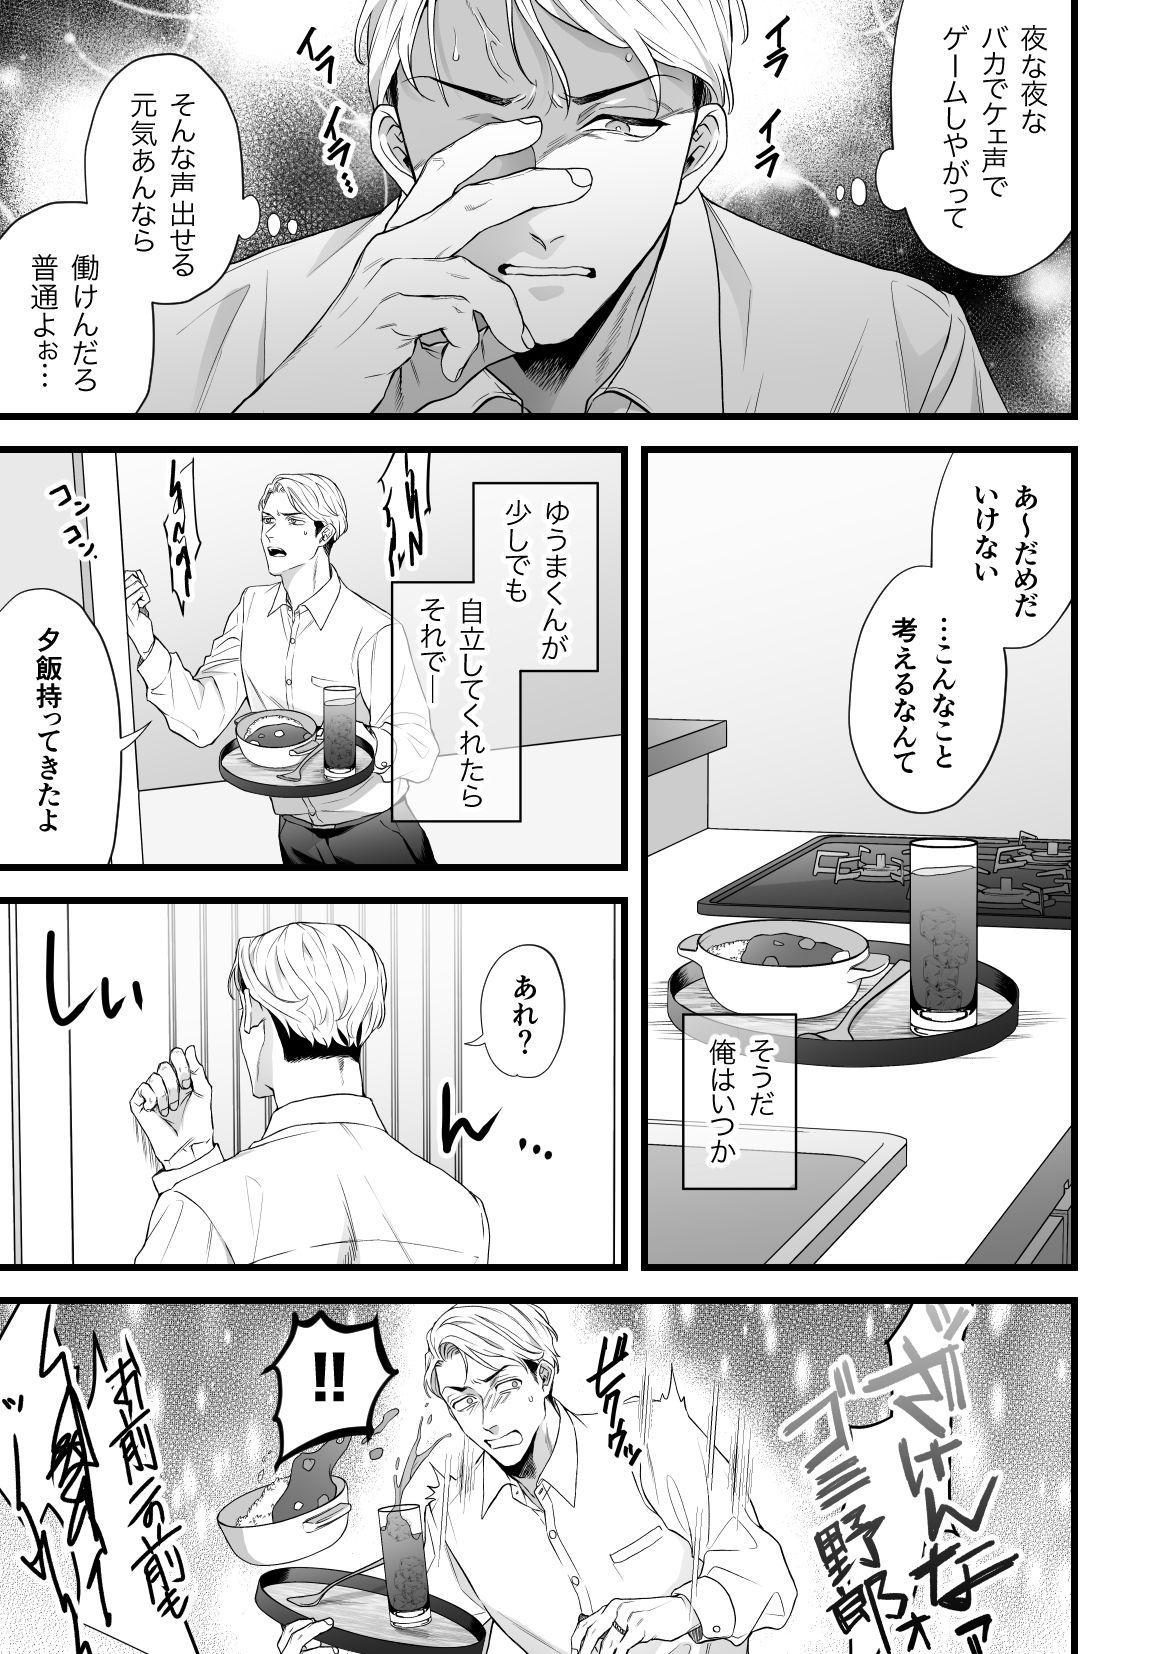 Gikei Ryoujoku 4